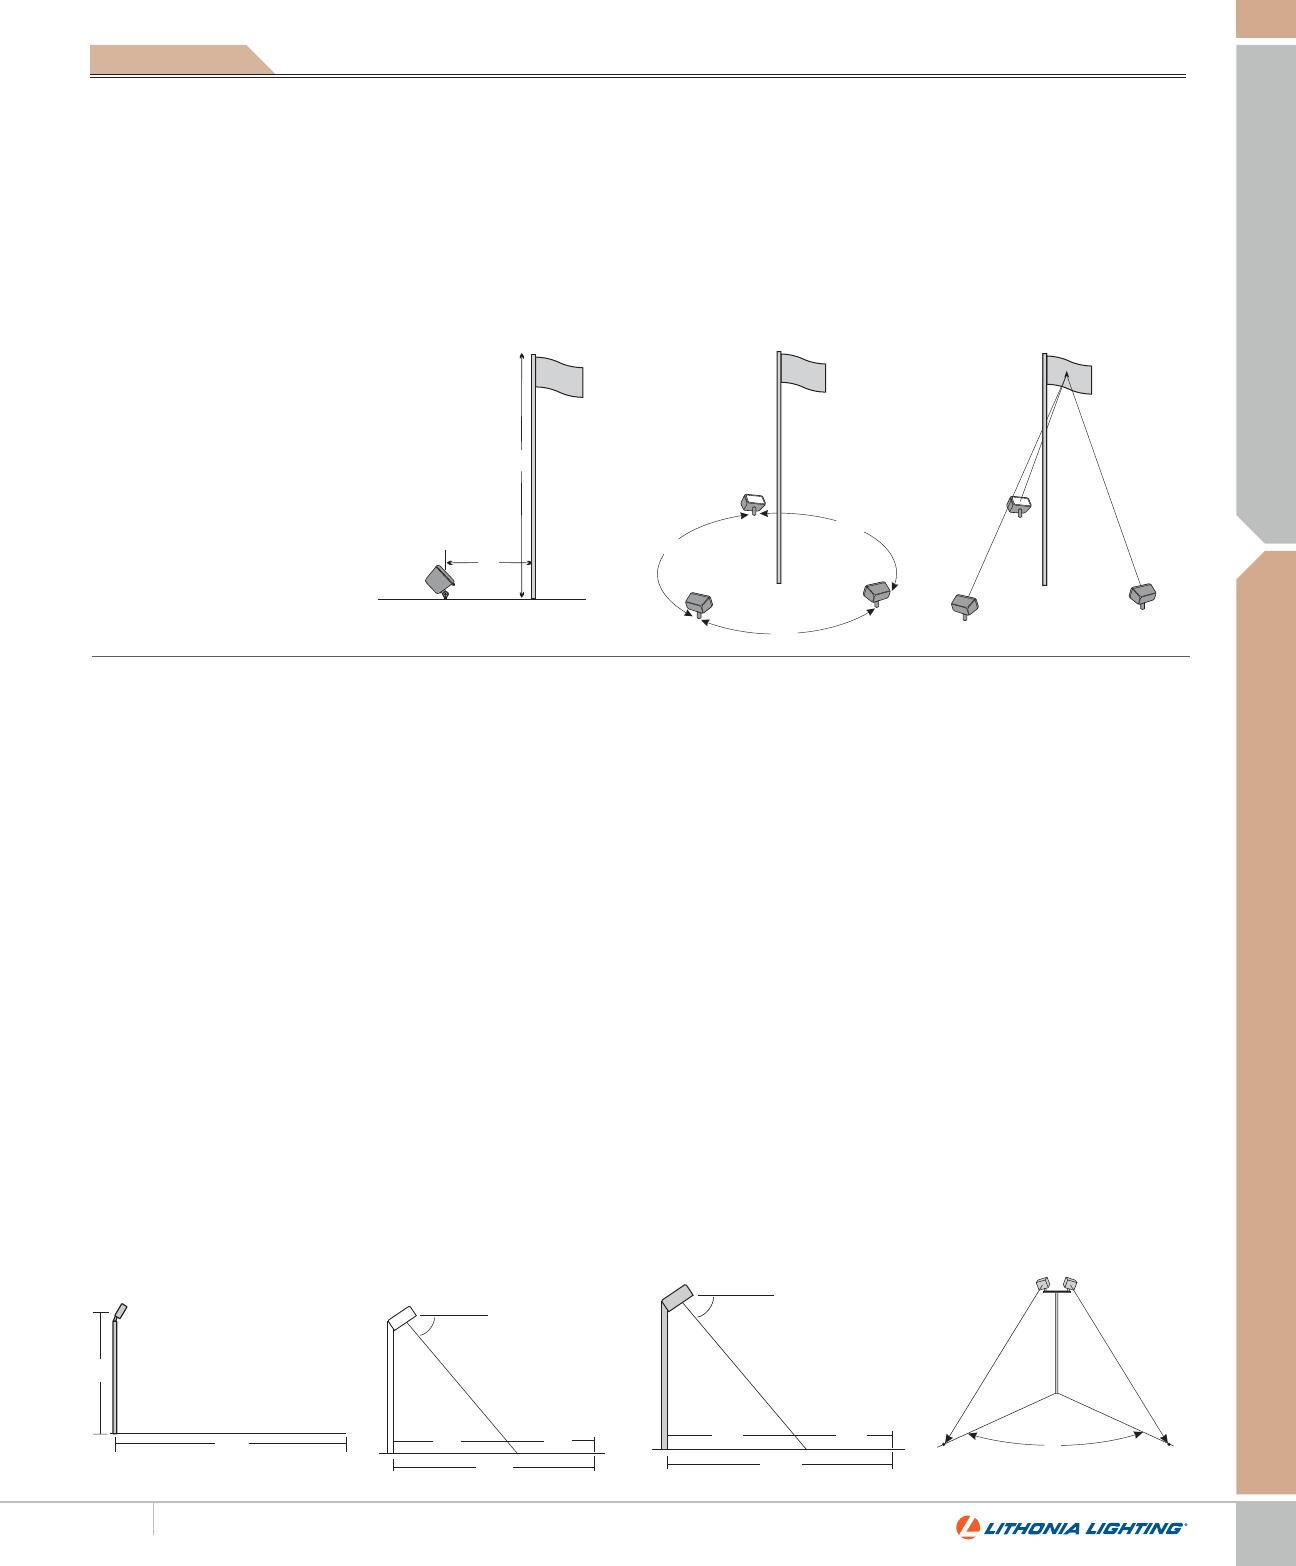 108753 Catalog Led Light Bulb Diagram Tzndpww